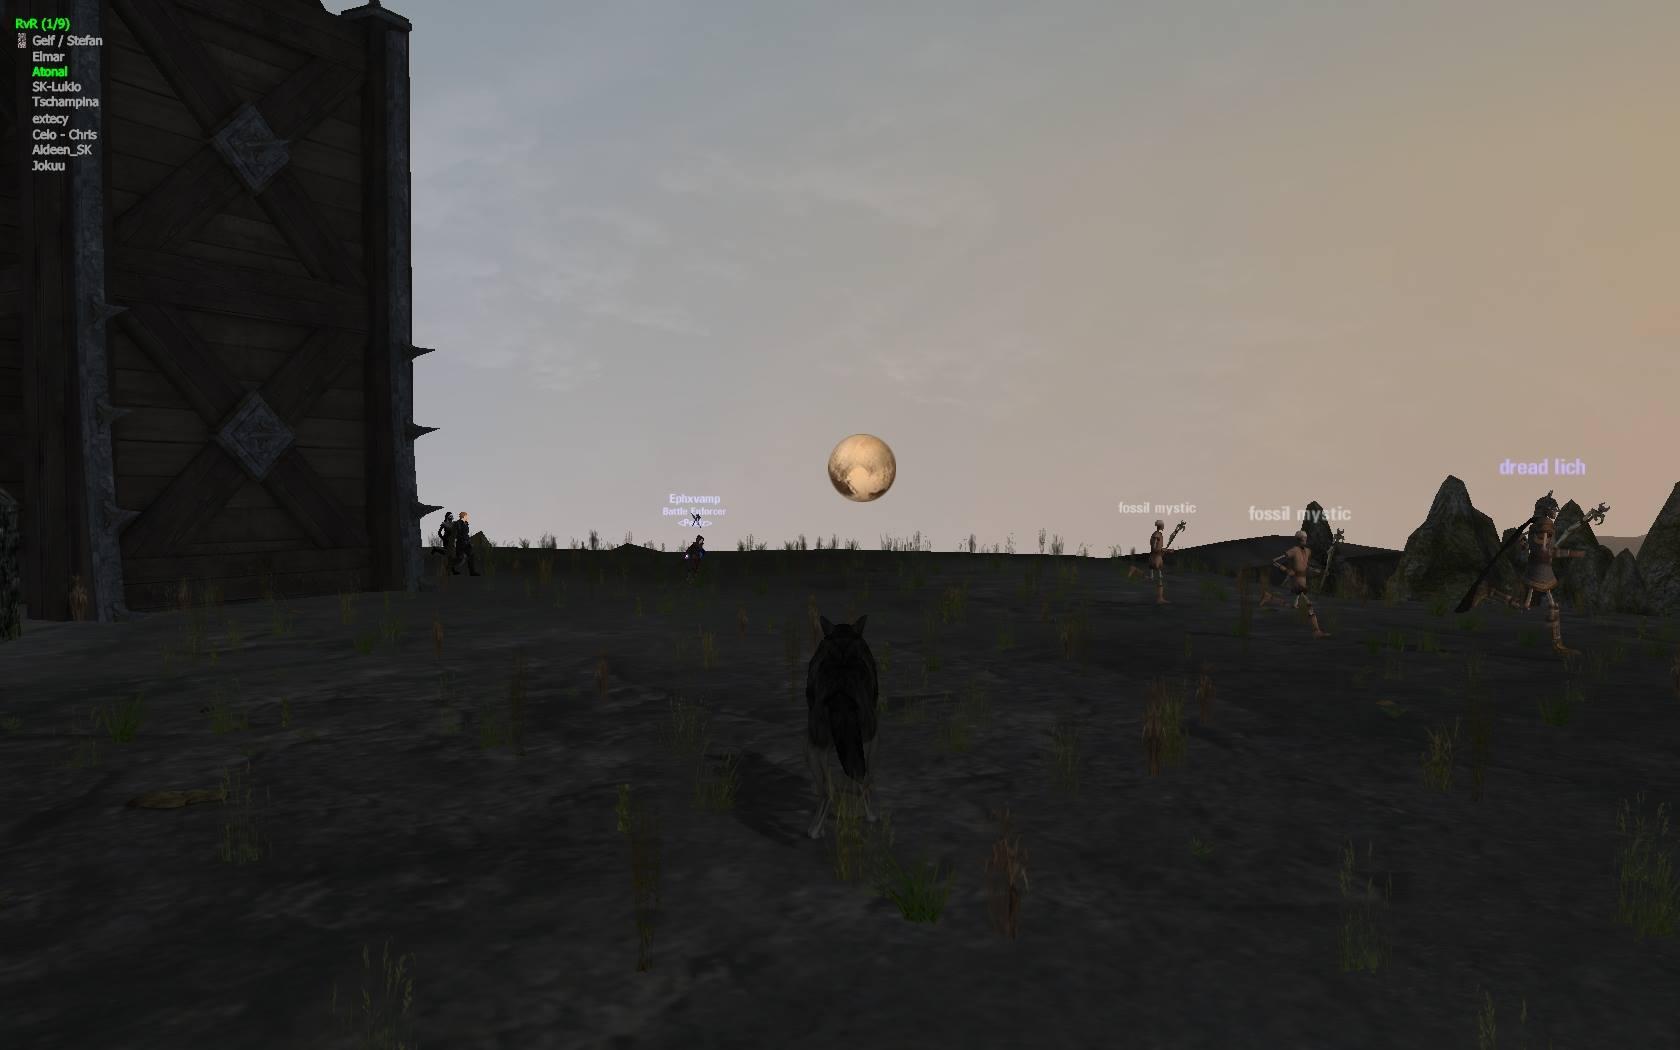 New Horizon of Plutolot